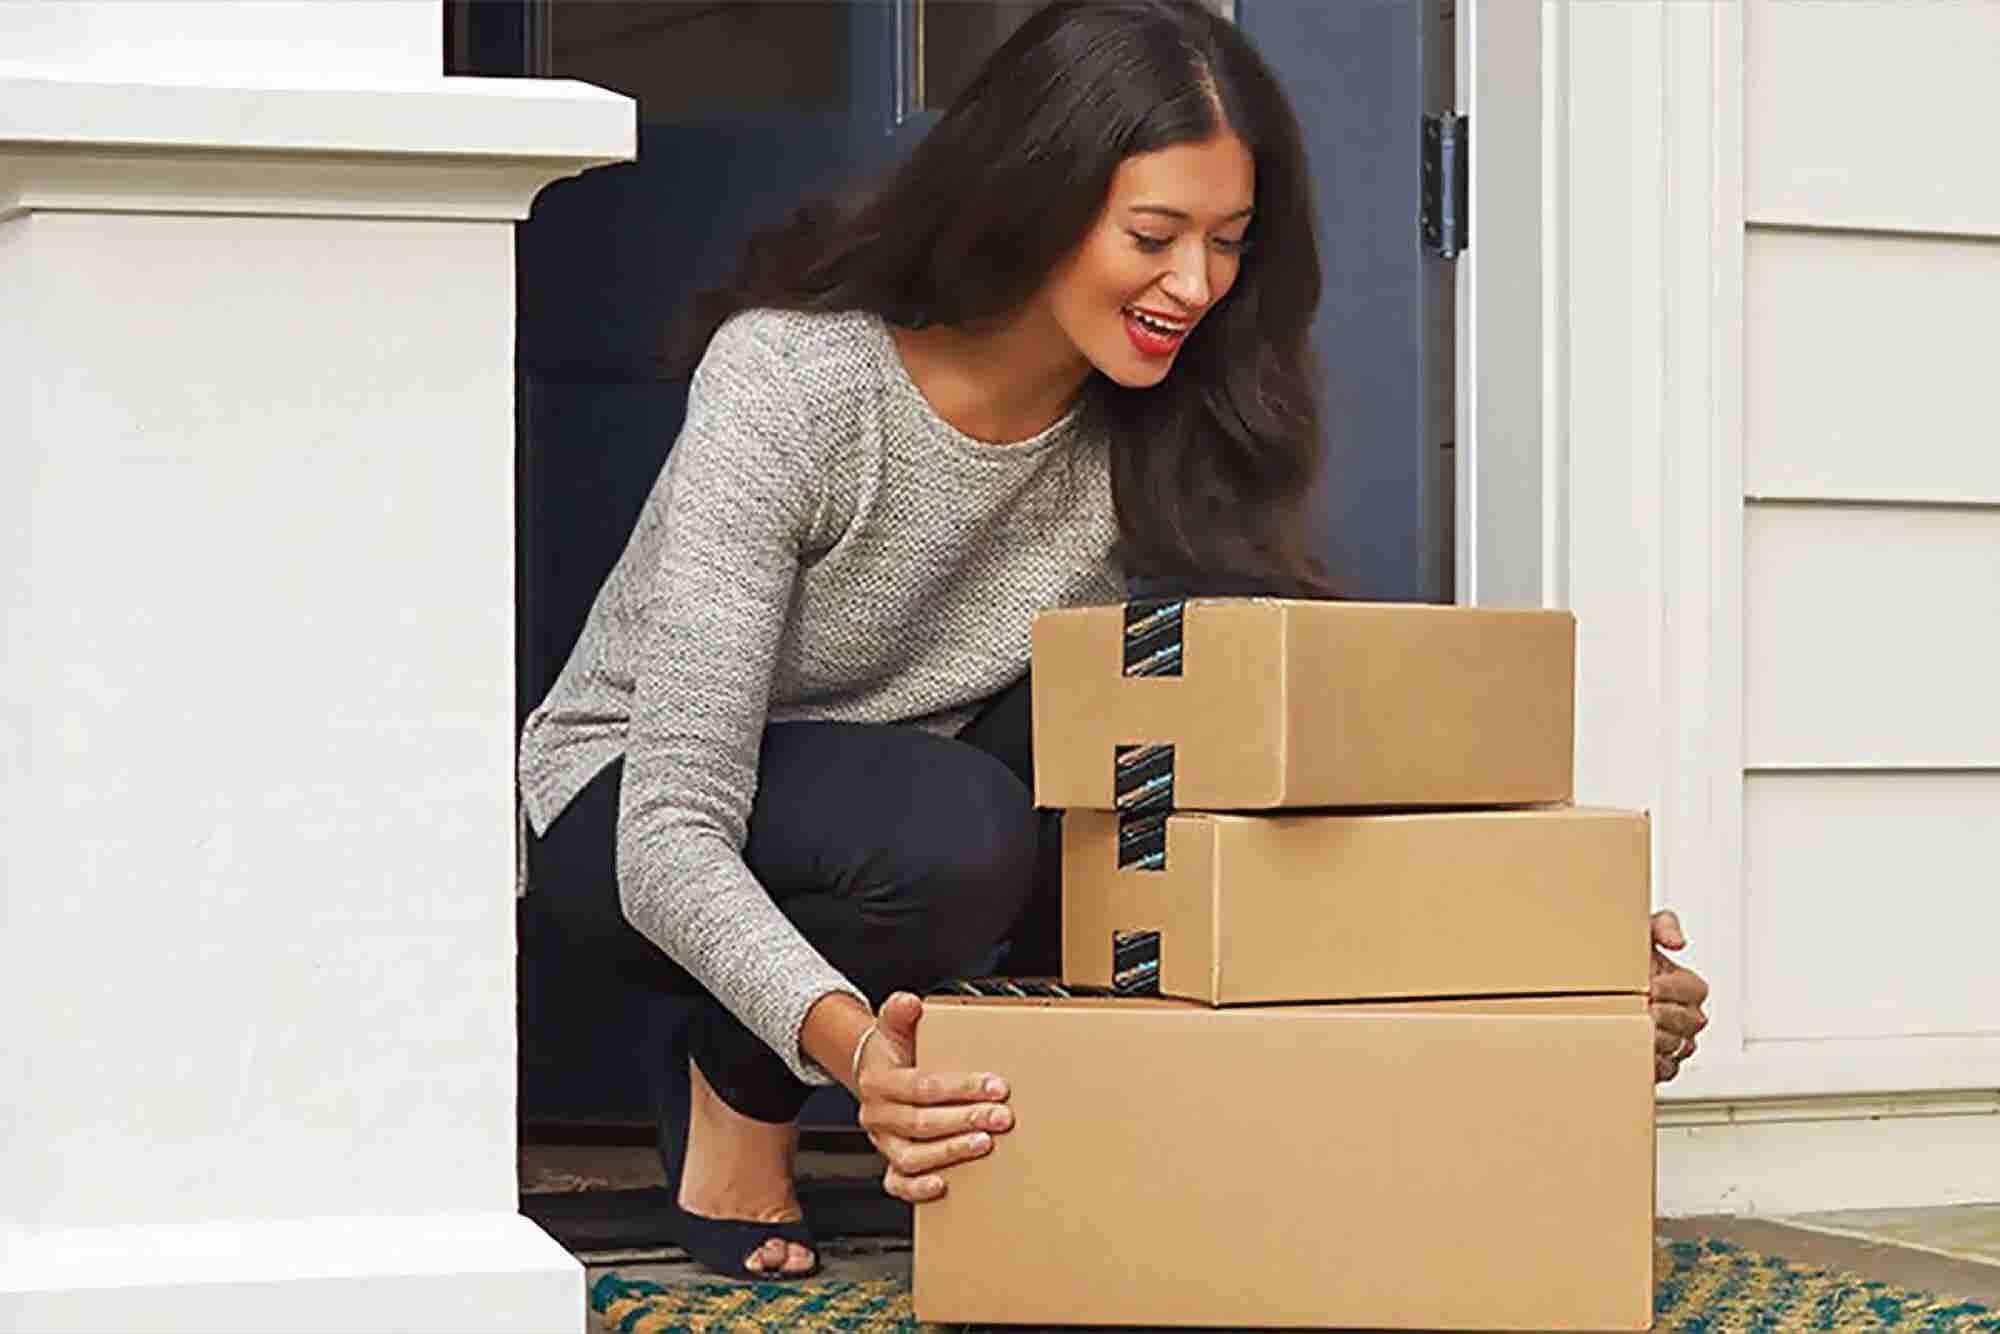 6 Shopping Tips for Amazon Prime Day Savings